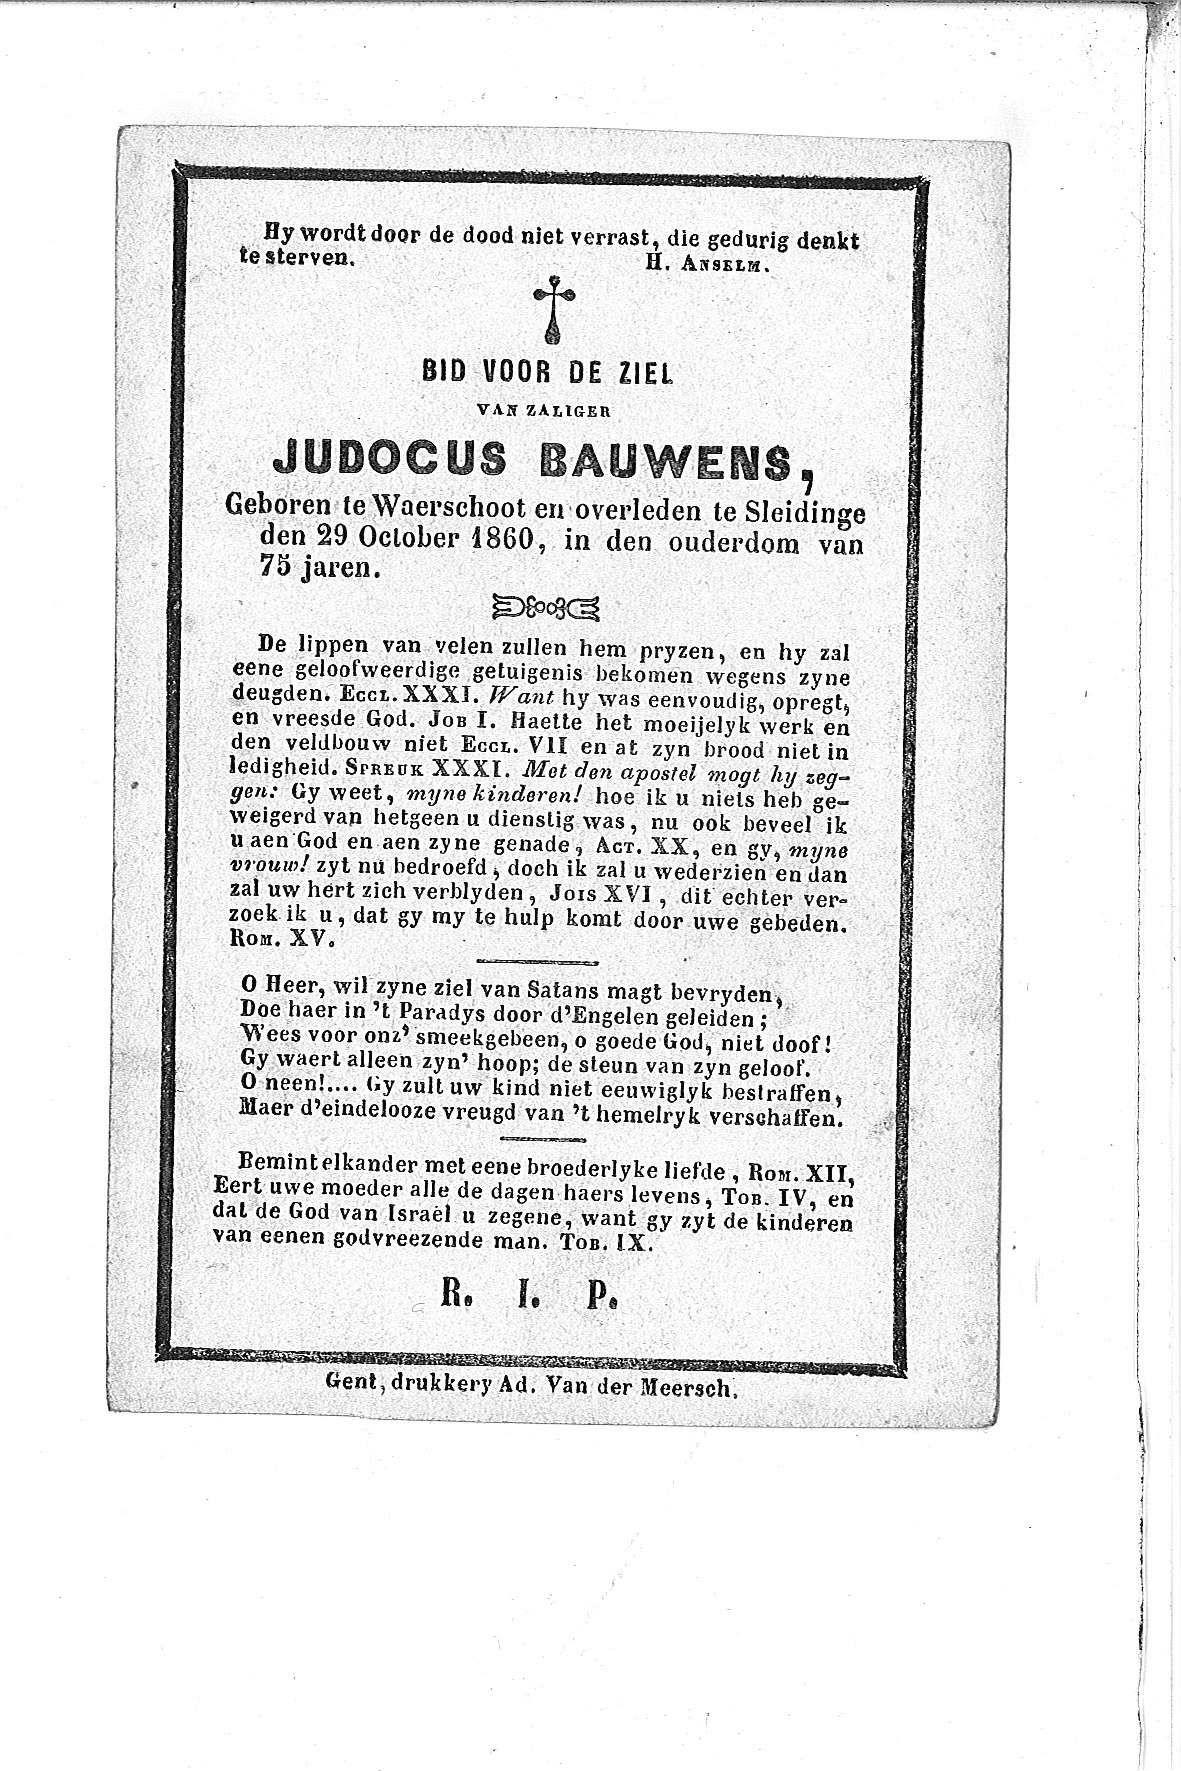 Judocus(1860)20101026161718_00008.jpg